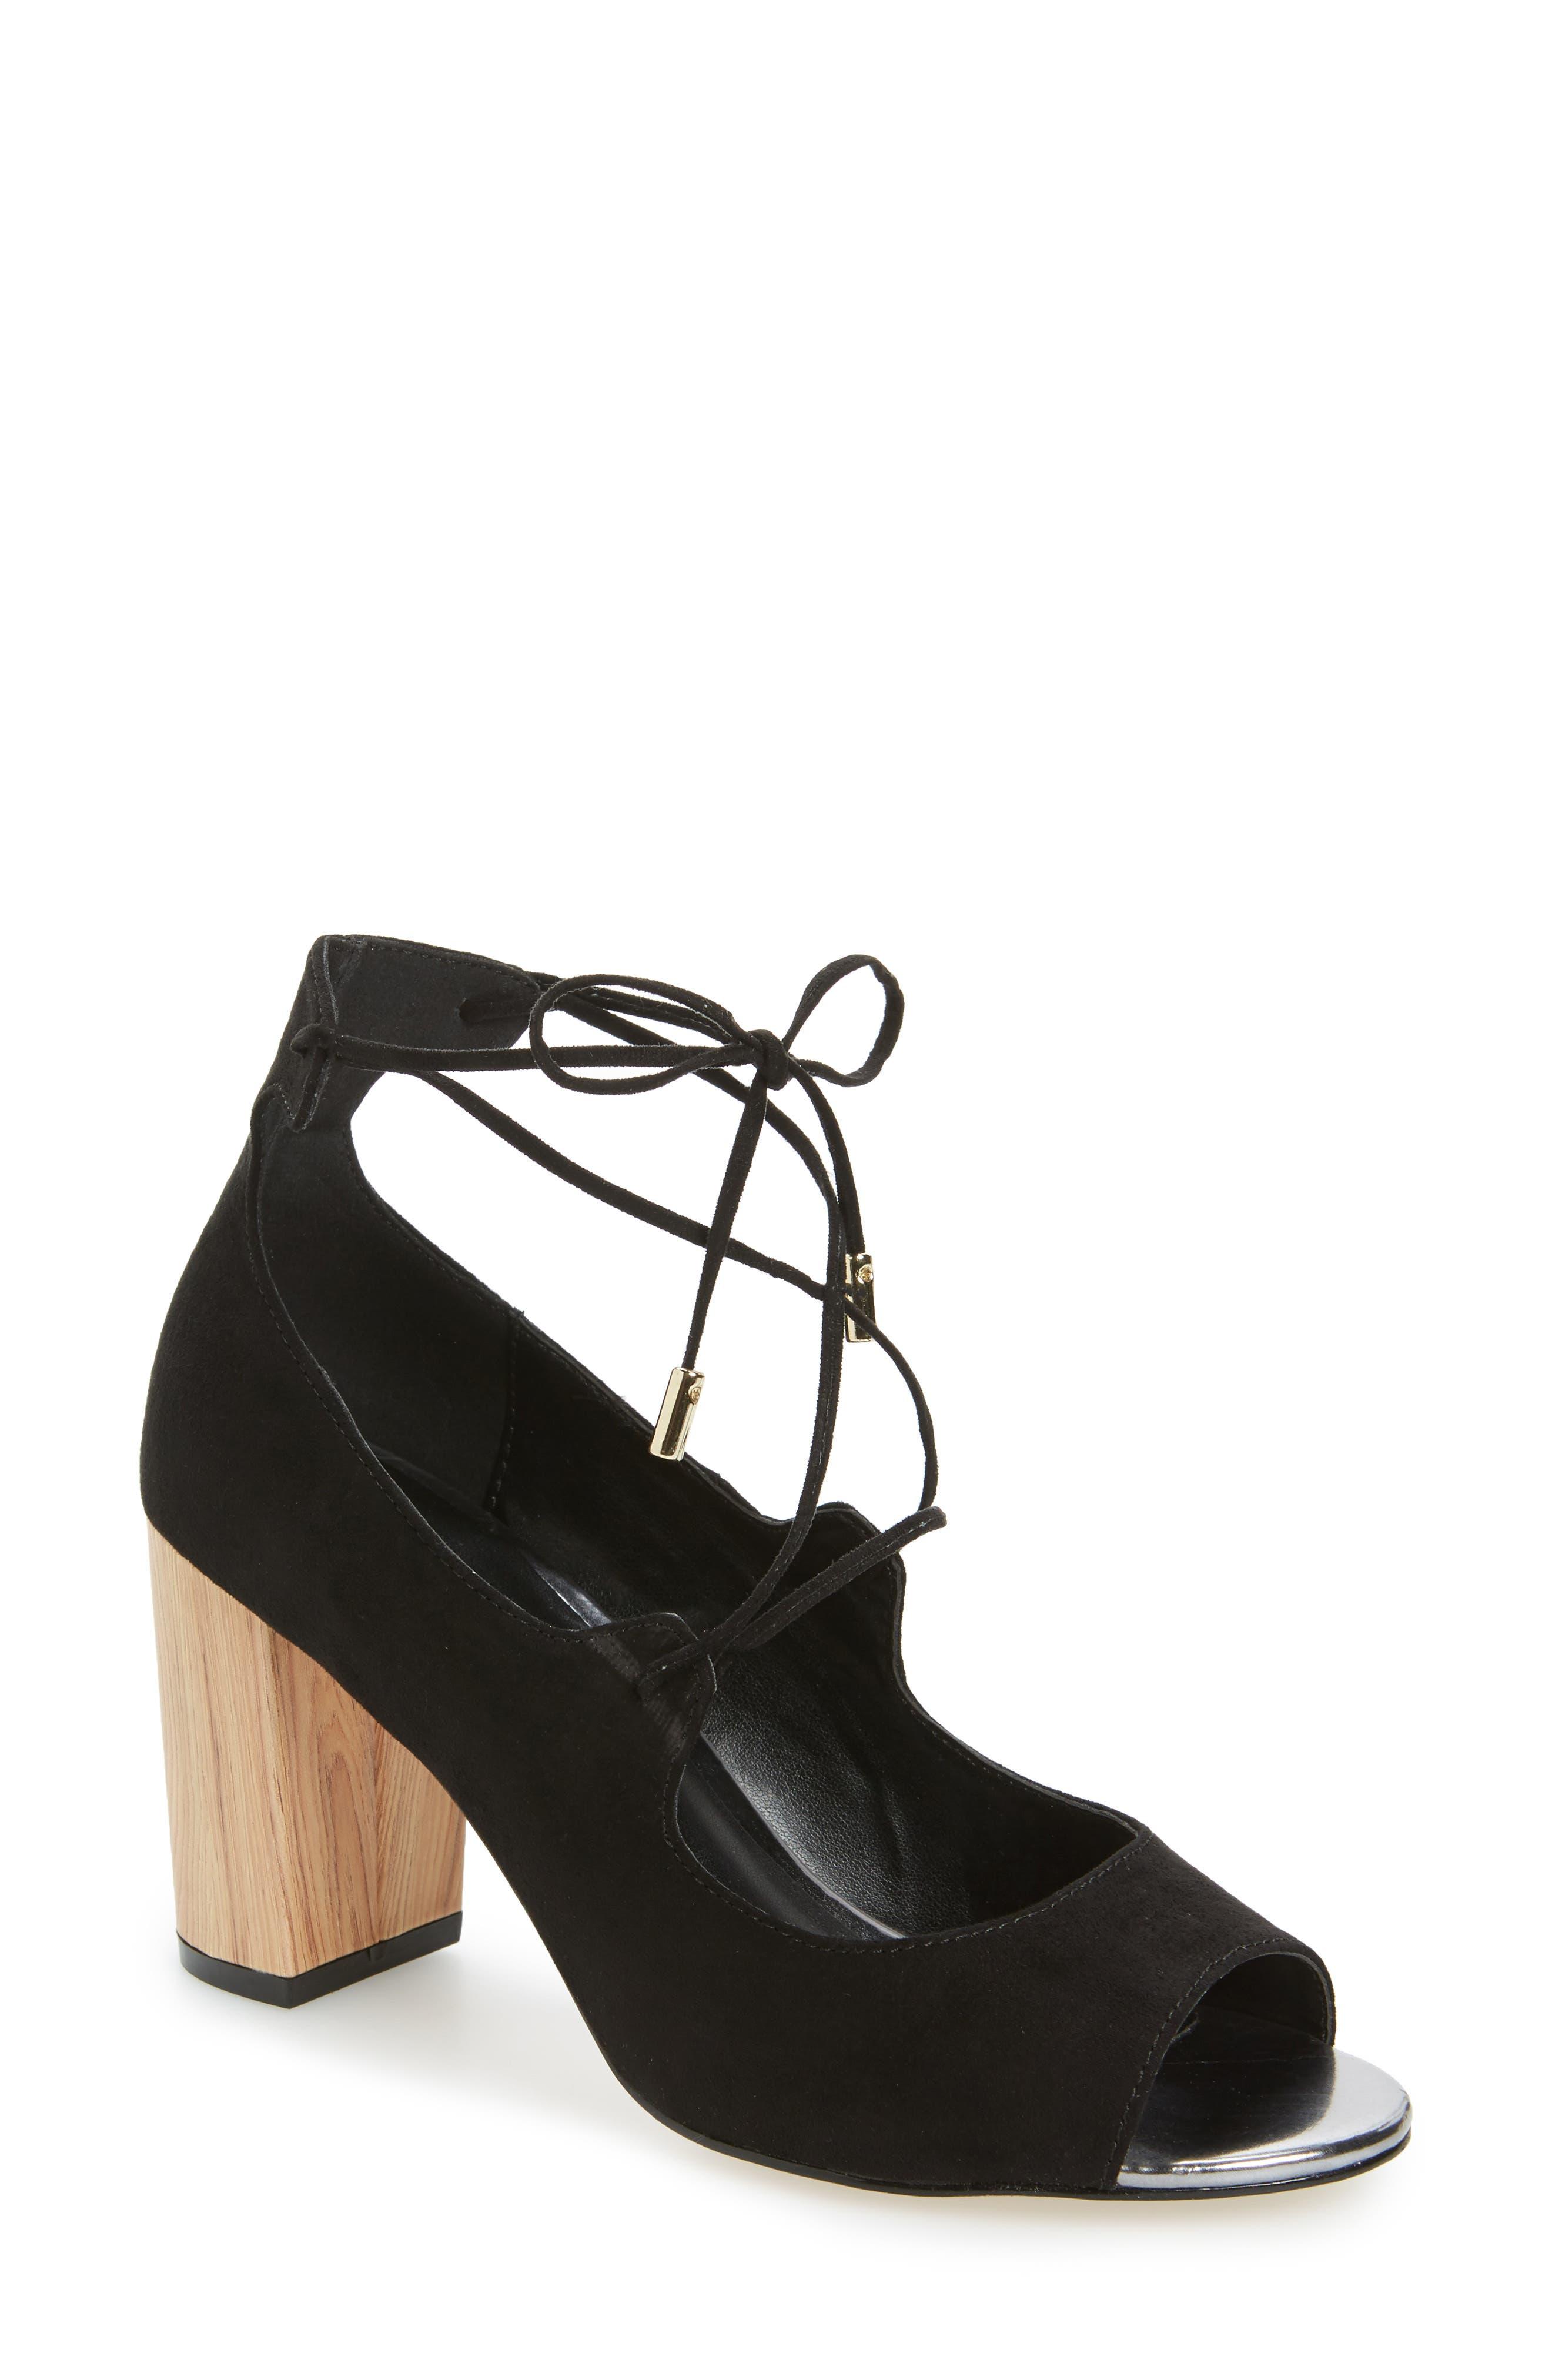 Main Image - Athena Alexander Vikki Block Heel Sandal (Women)